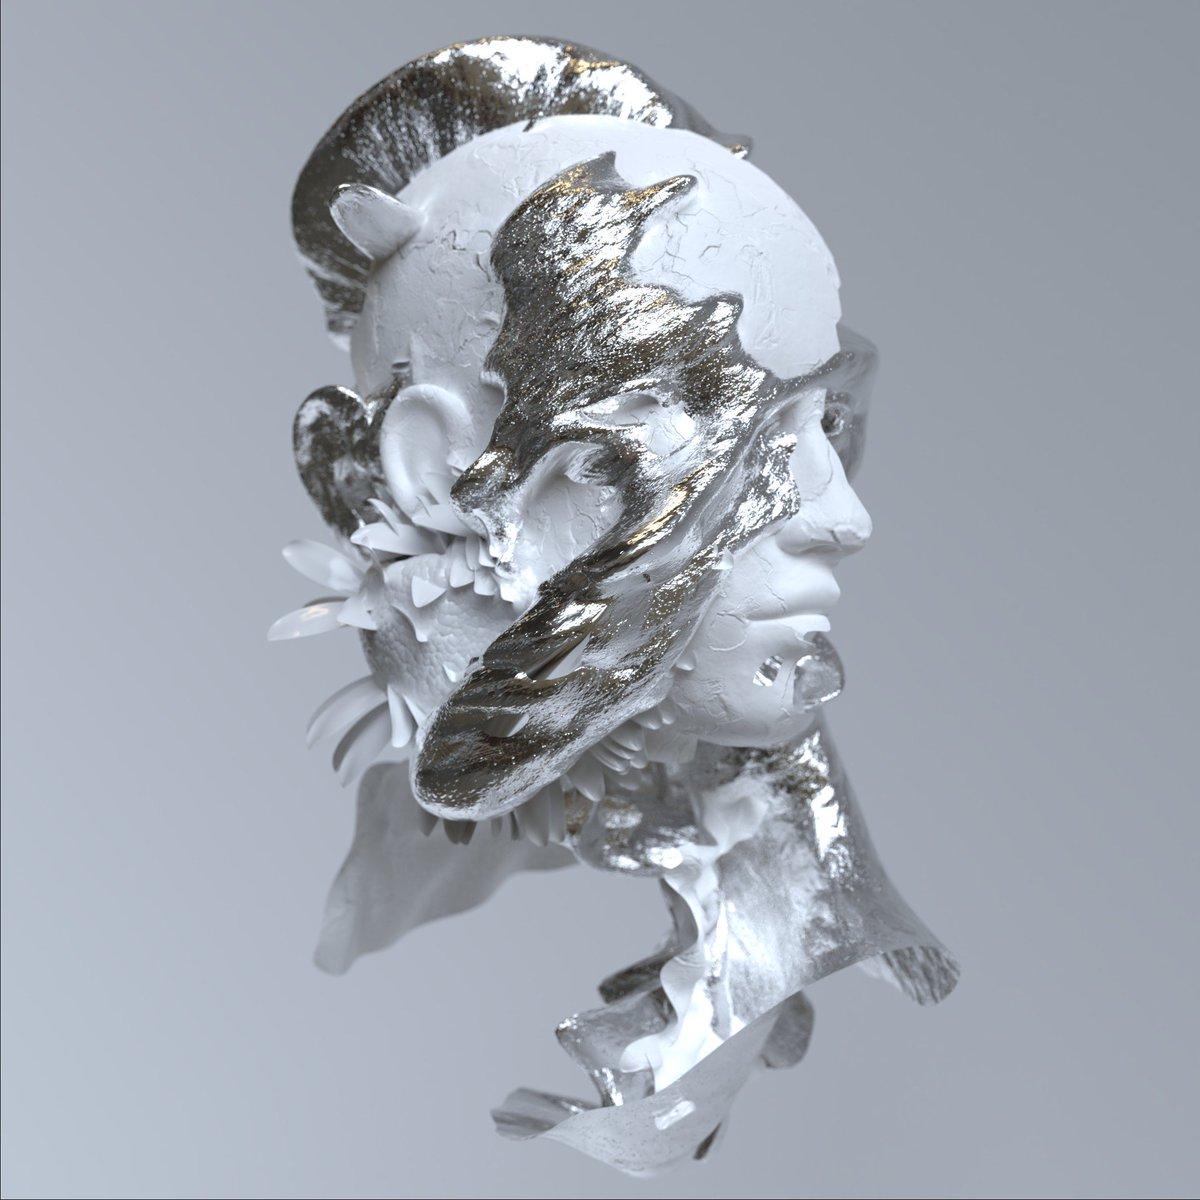 NEW ALBUM 'Return 0' Out Now -- Digital Album available on Bandcamp ashkoosha.bandcamp.com/album/return-0